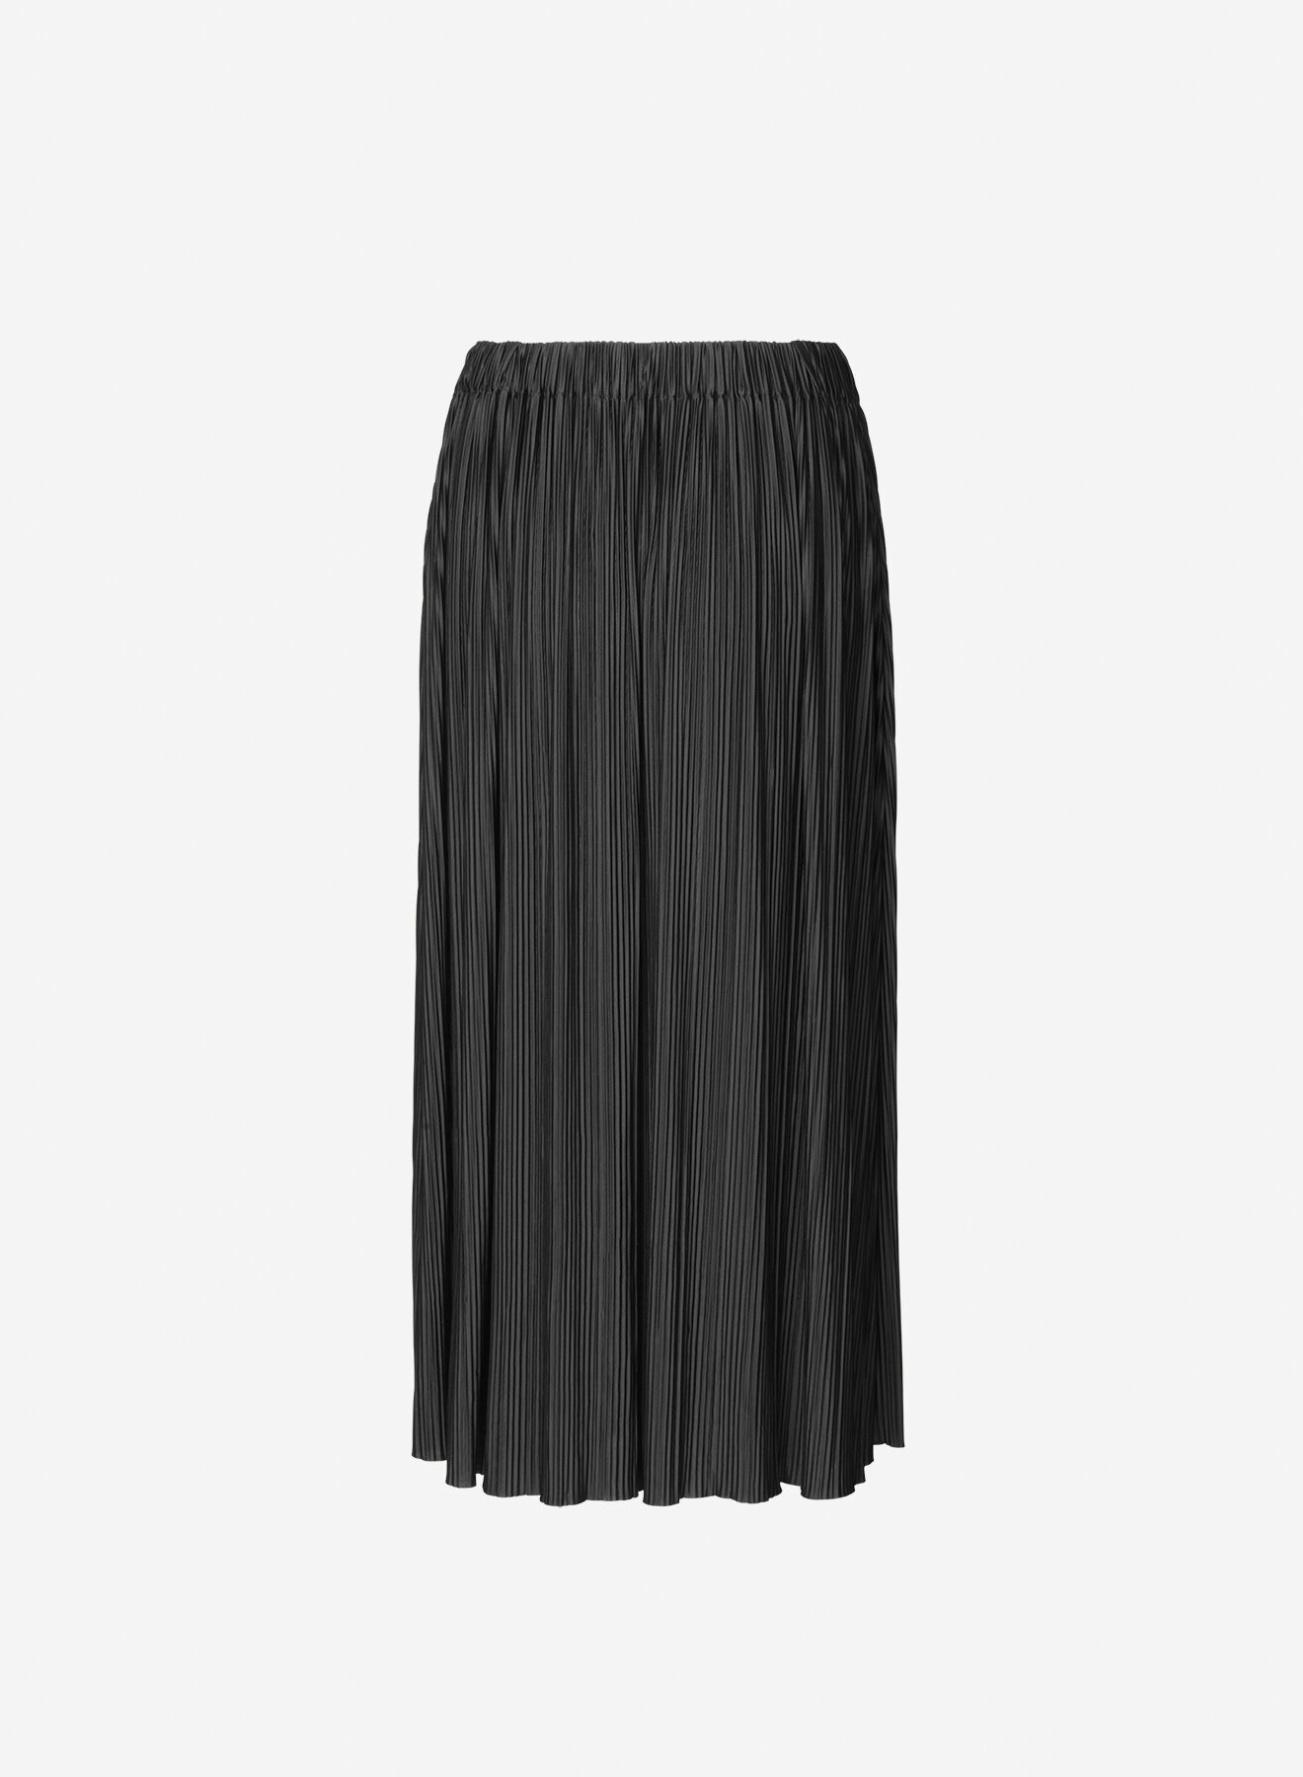 Uma Skirt-2